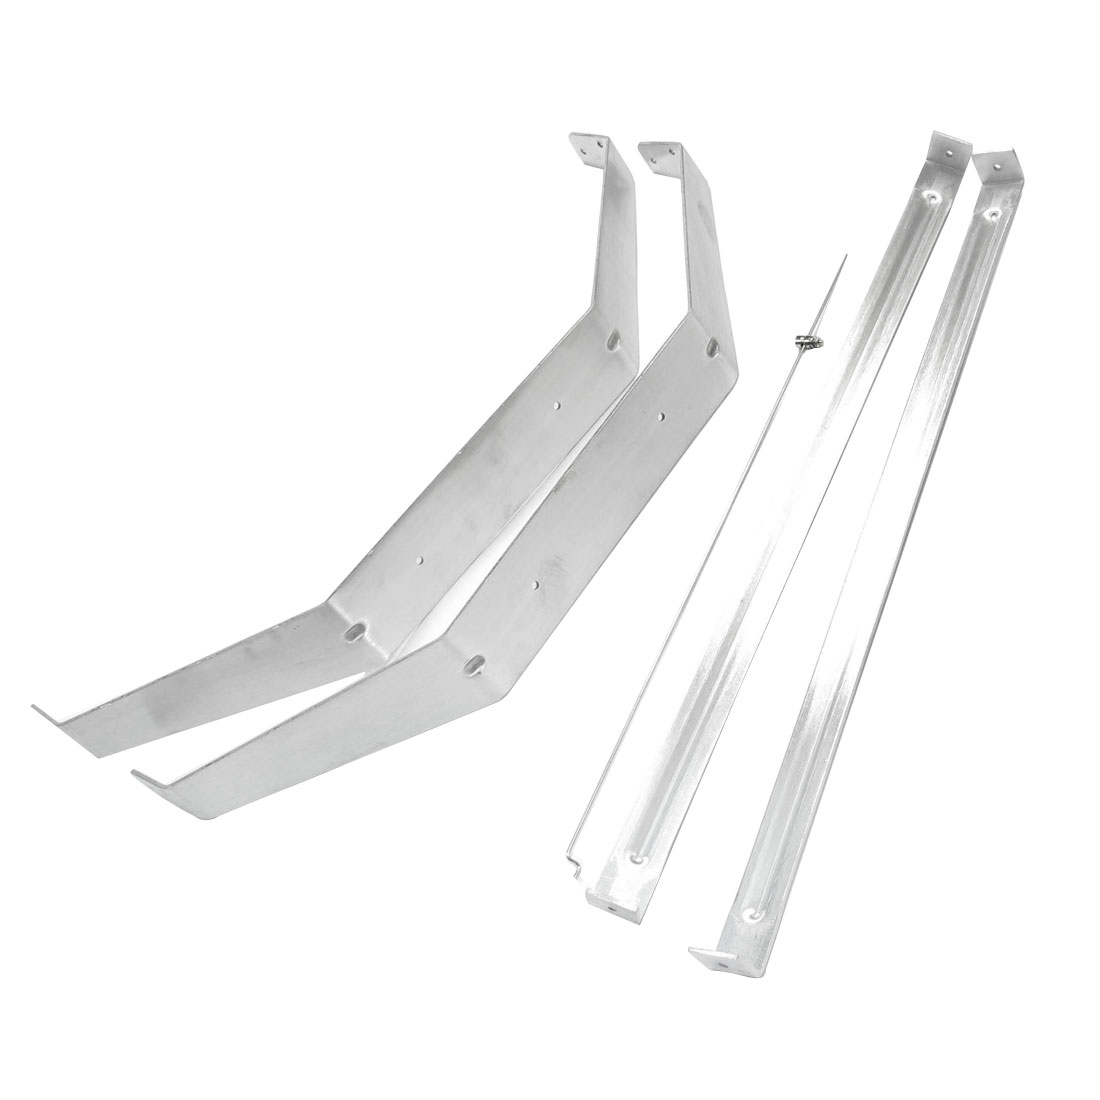 Replacement Silver Tone Aluminium RC Seaplane Water Plane Model Bracket Support Holder Set